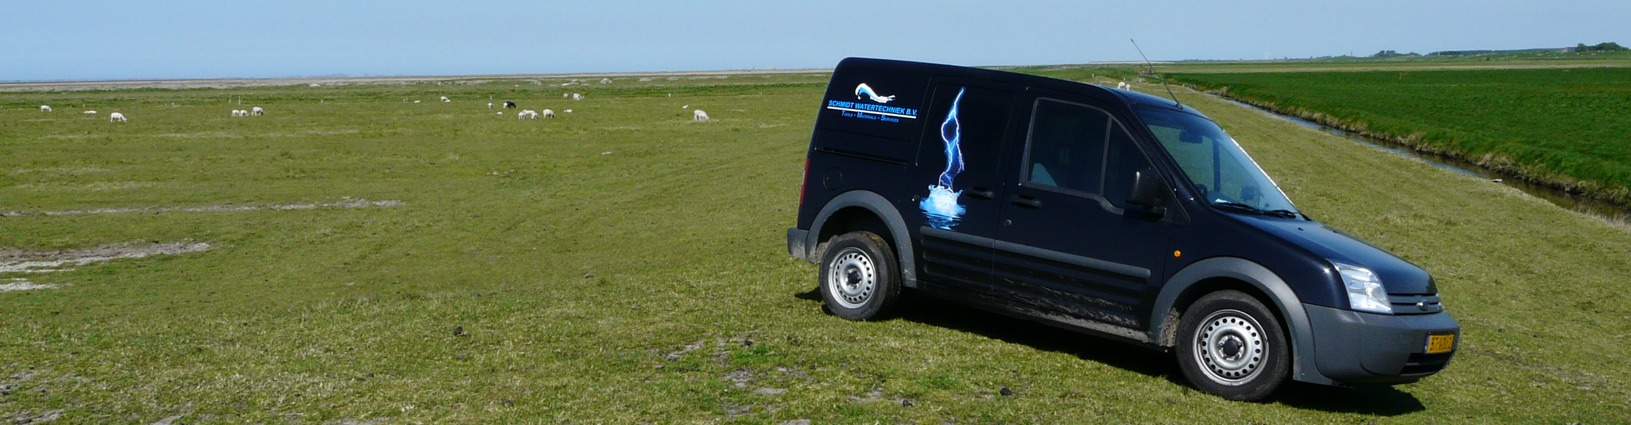 Ford op grasveld